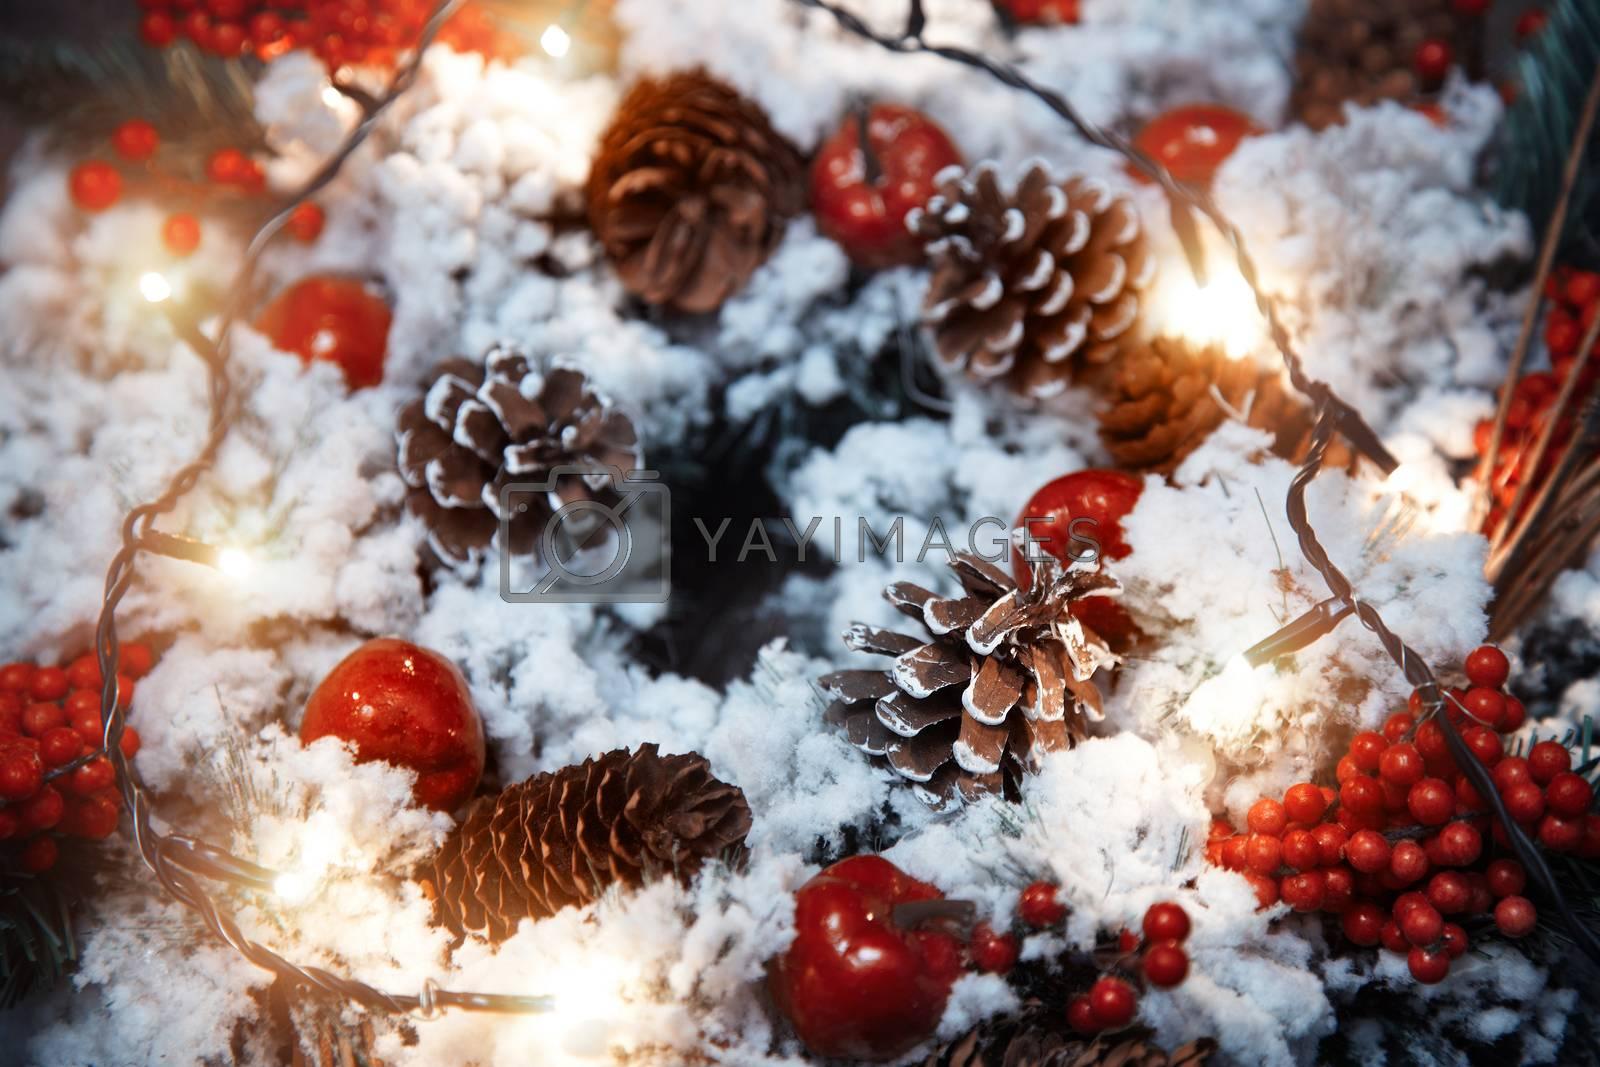 Christmas wreath and light. Close-up horizontal photo